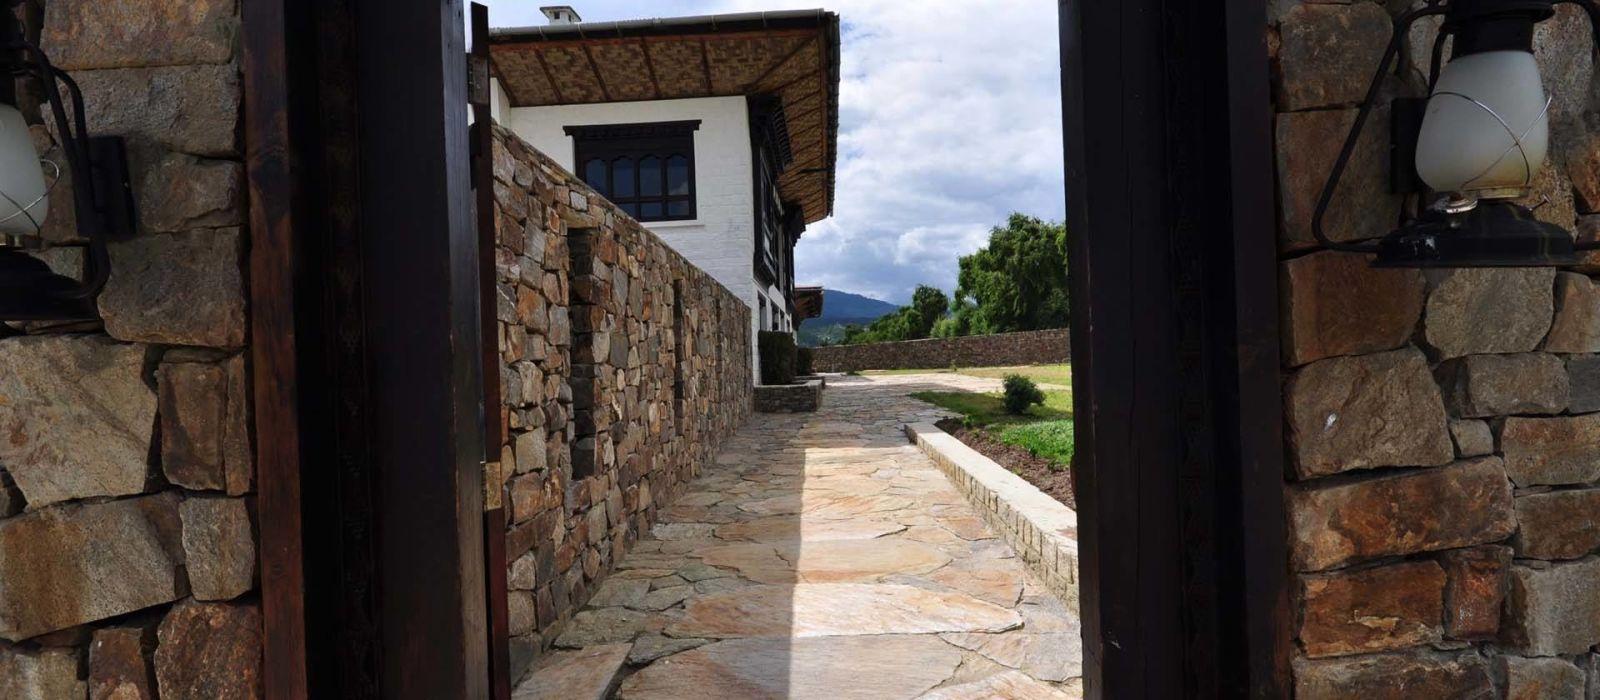 Hotel The Village Lodge, Bumthang Bhutan